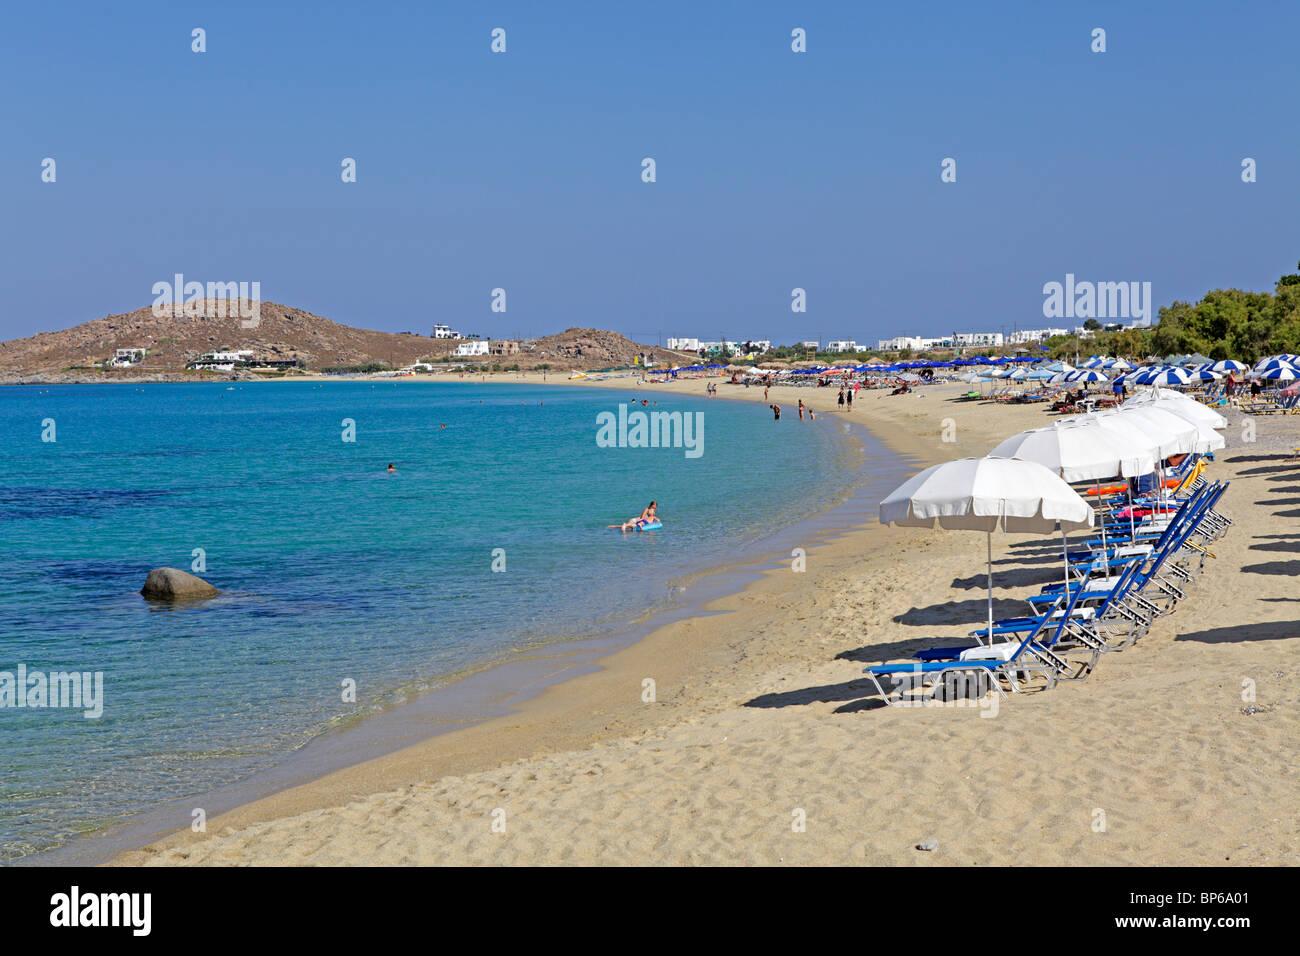 beach of Agios Prokopios, Island of Naxos, Cyclades, Aegean Islands, Greece Stock Photo